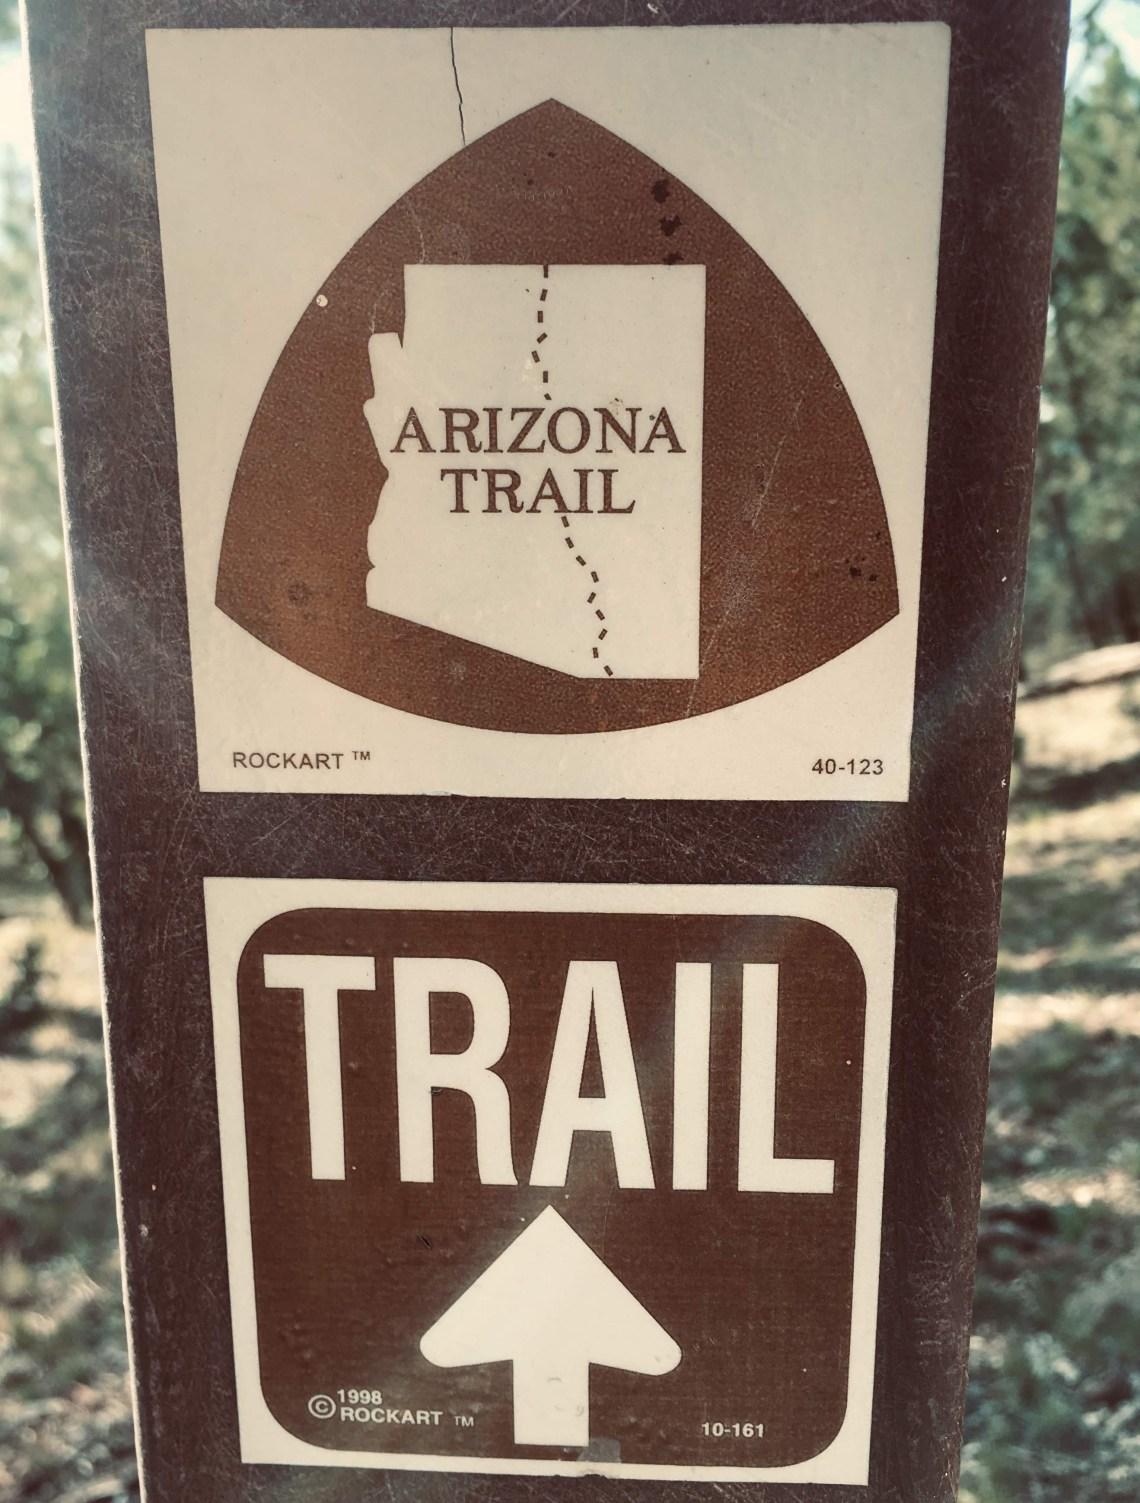 Arizona Trail directional sign